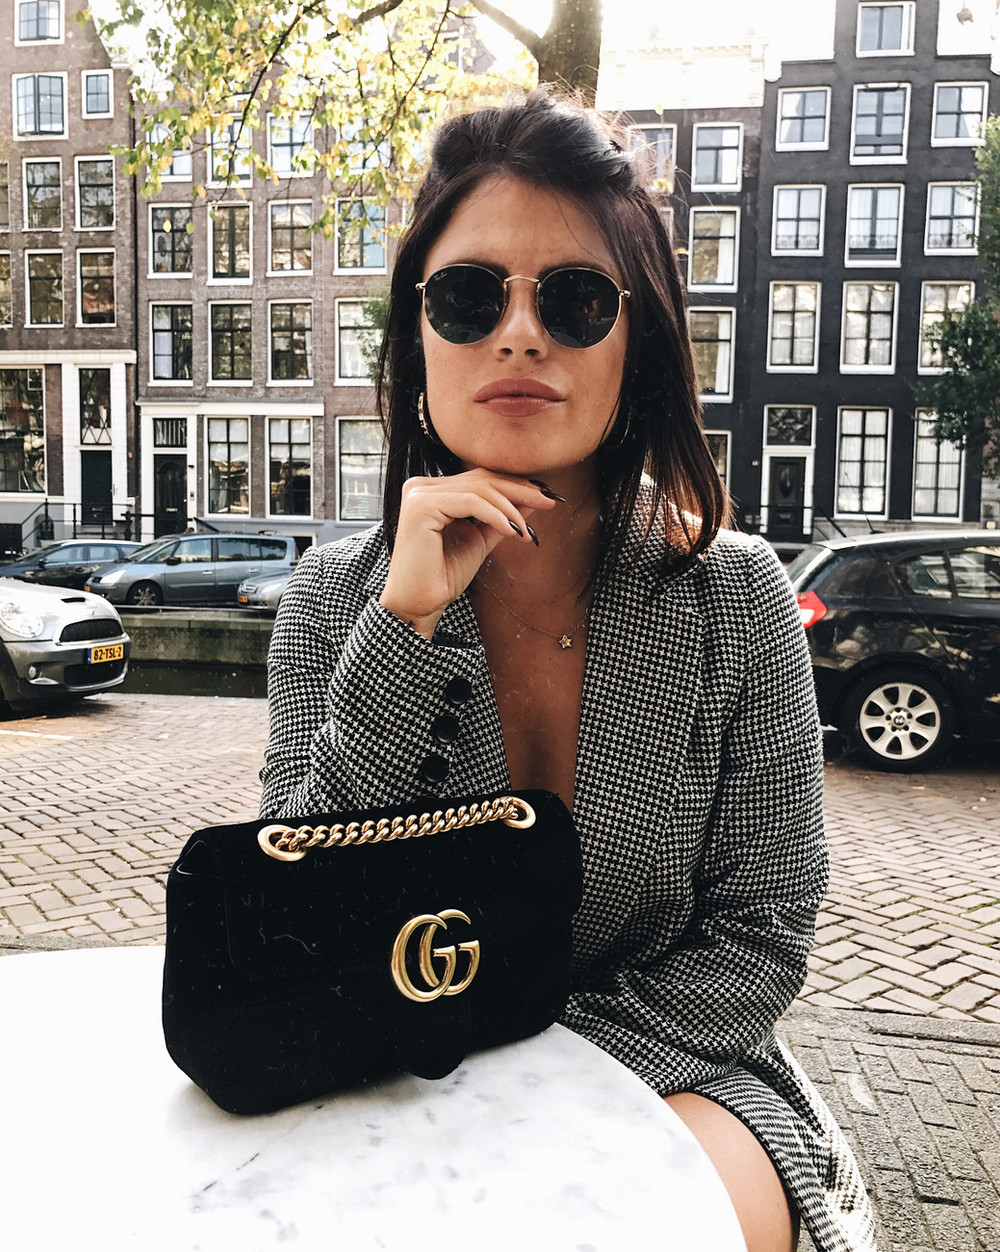 When in Amsterdam...